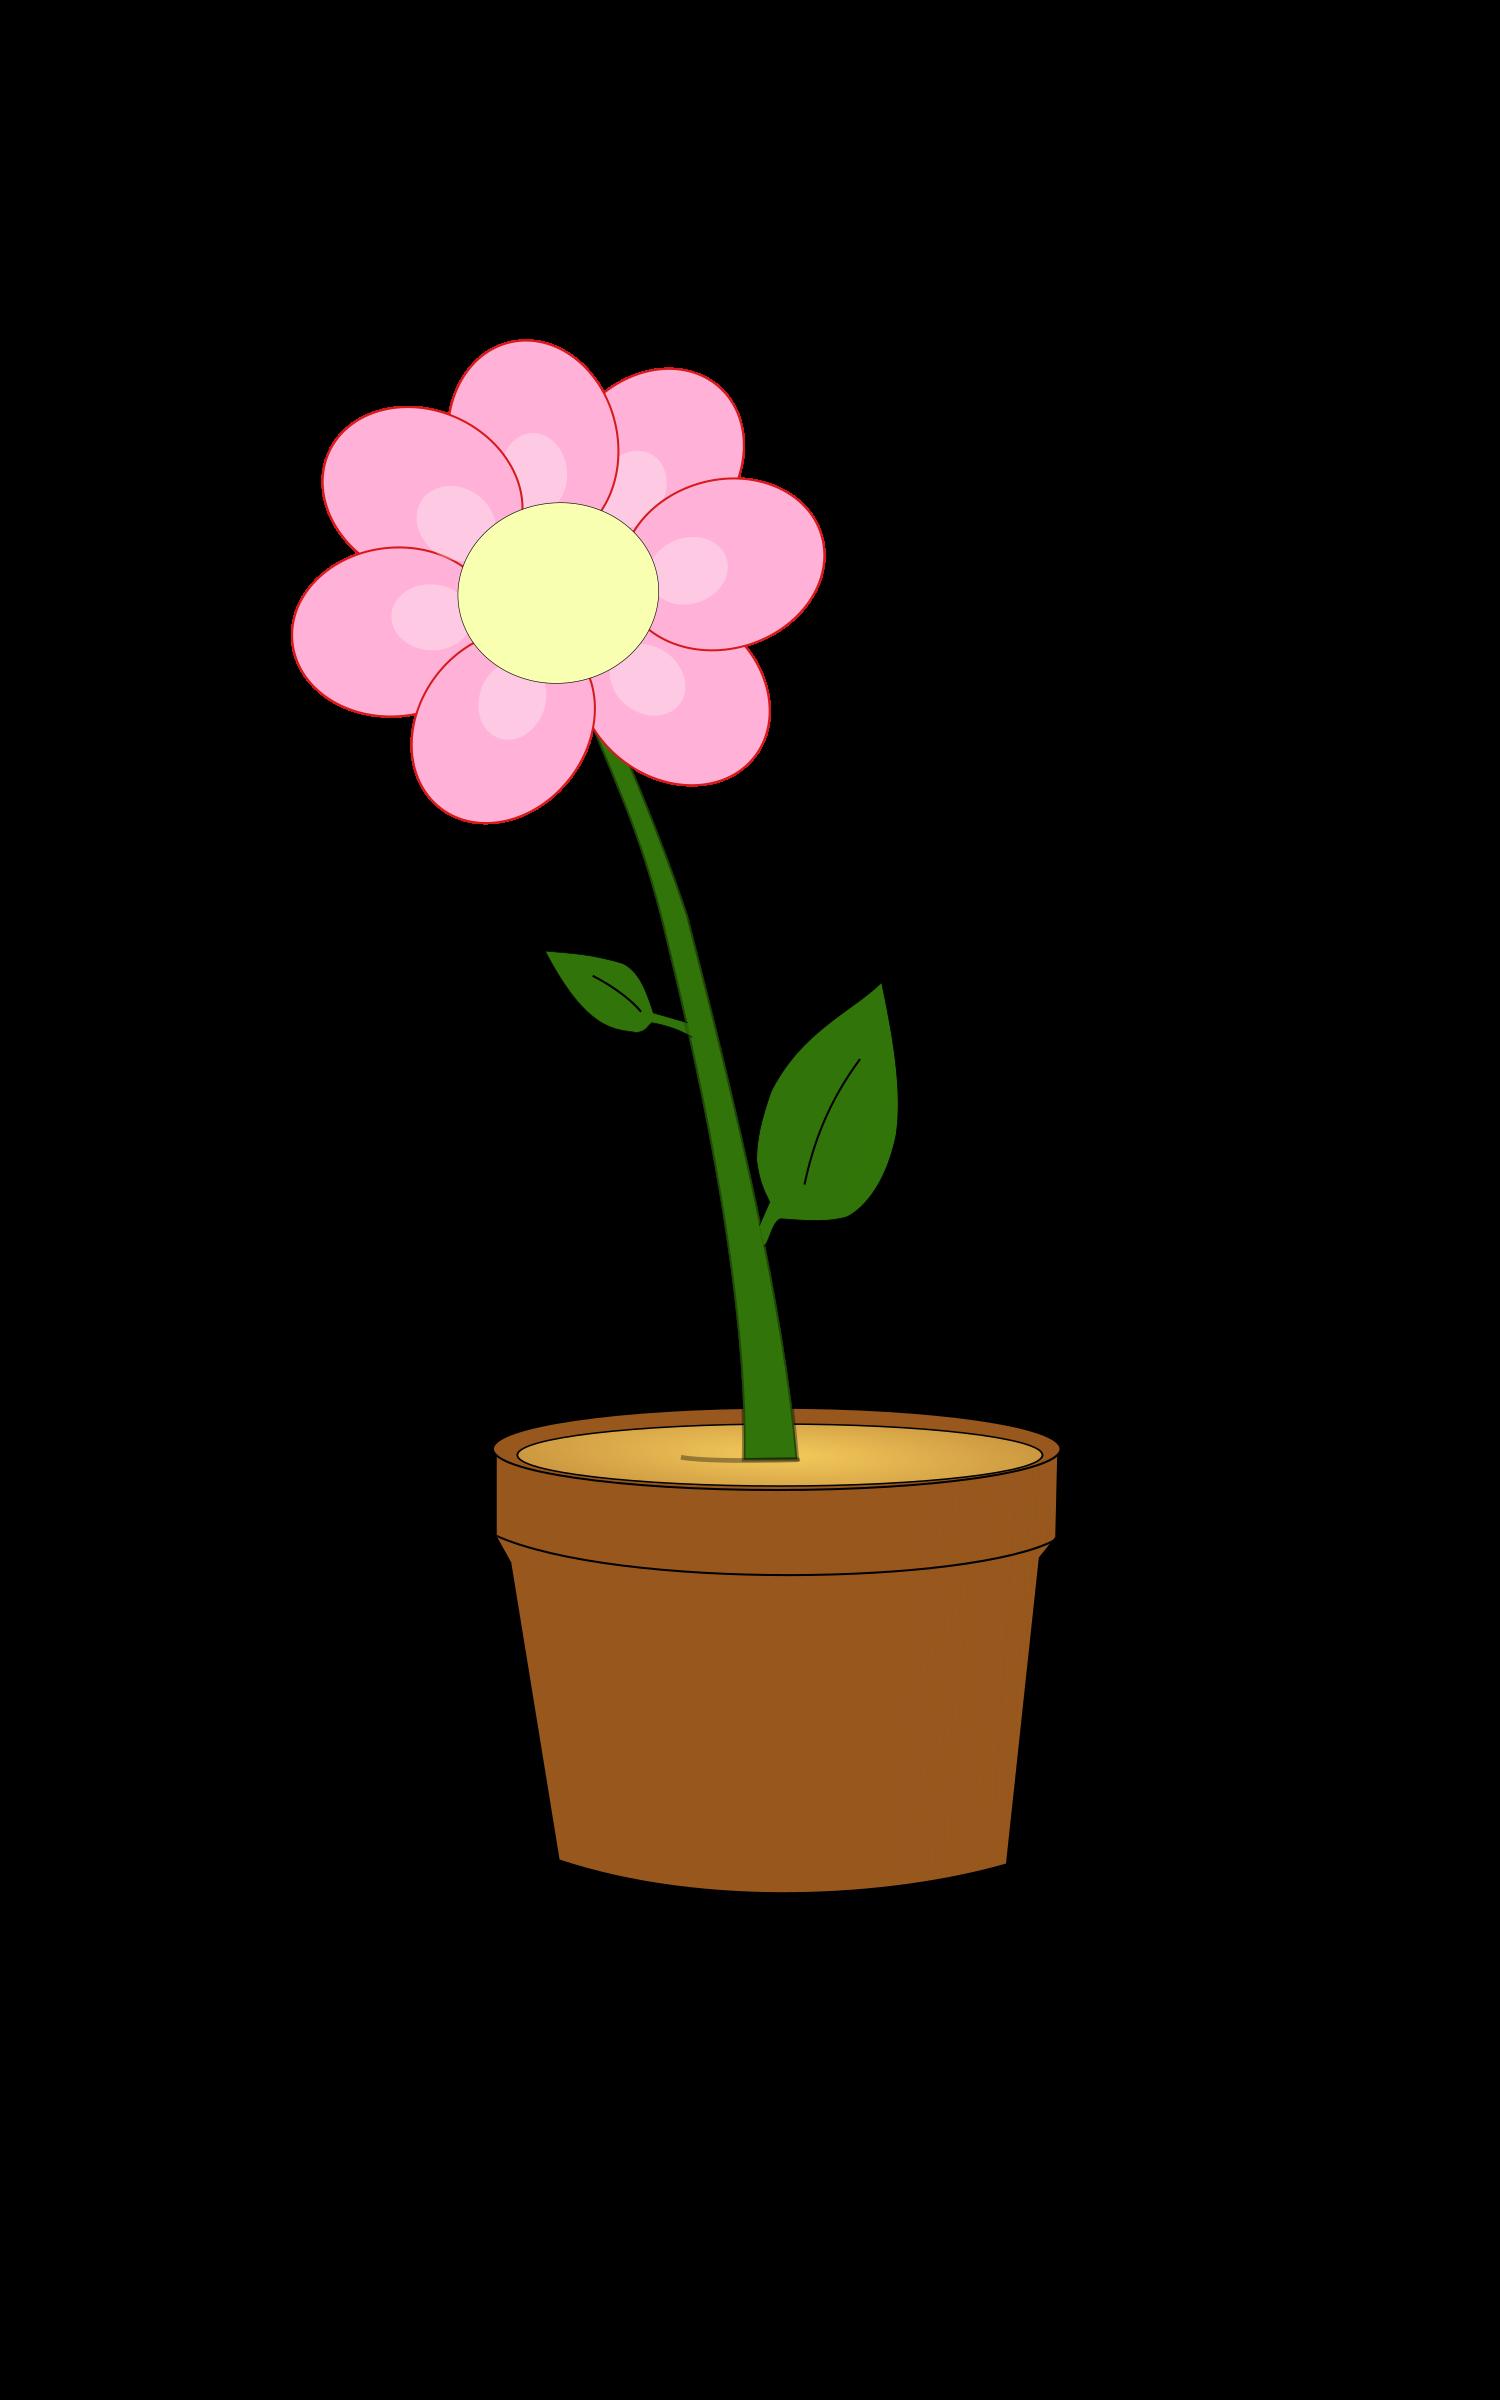 Flower pot clipart free vector transparent download Clipart - Blumentopf vector transparent download